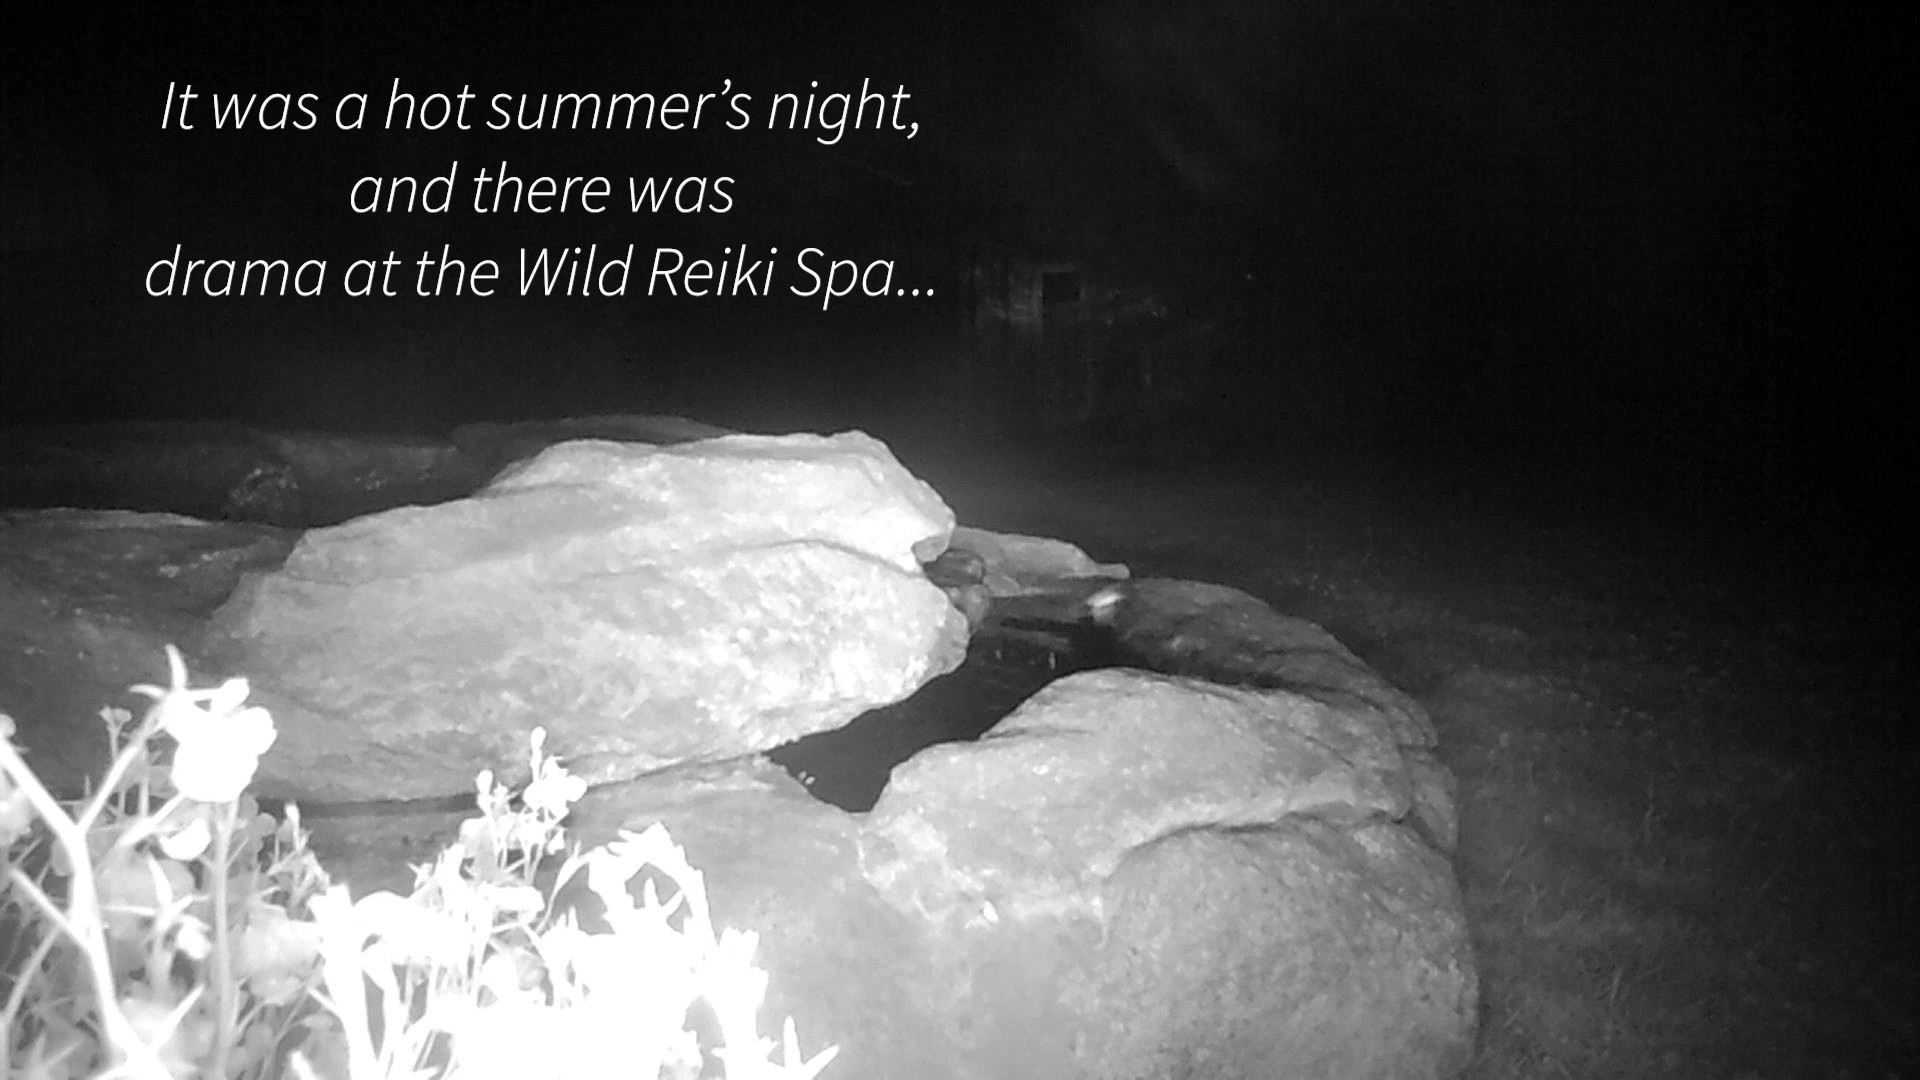 Heat Wave Drama At The Wild Reiki Spa